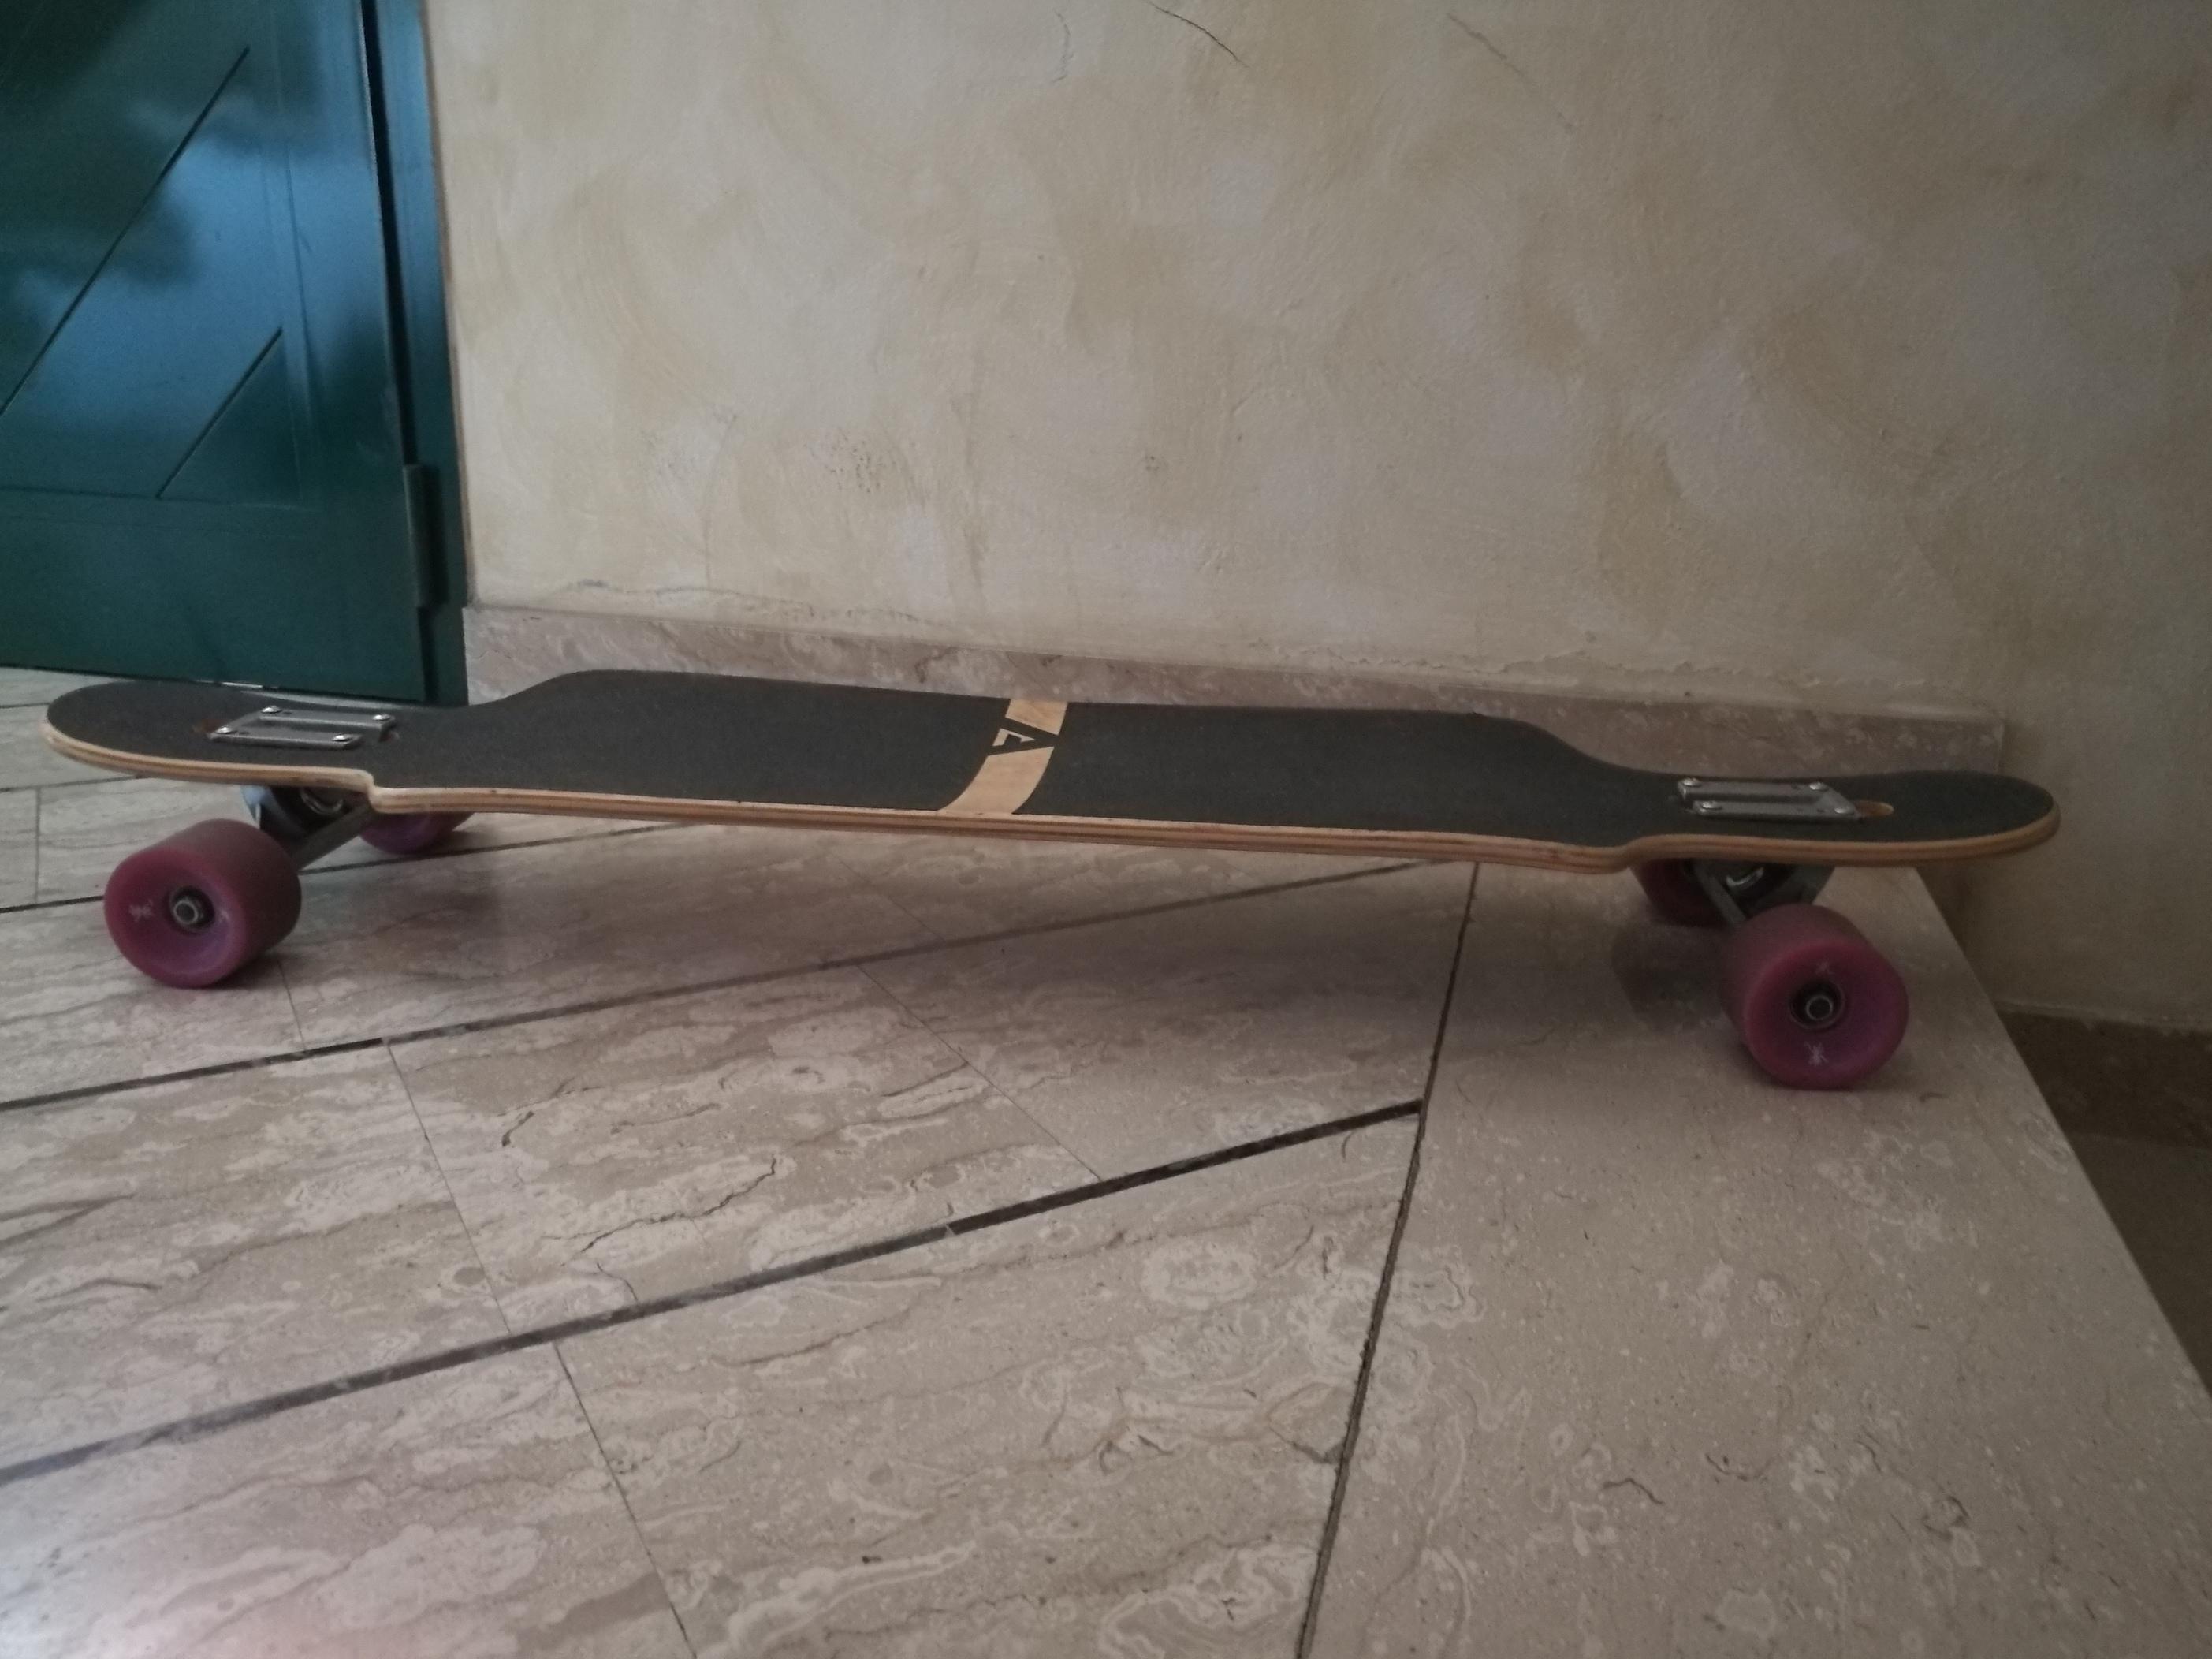 Turnigy Skateboard Conversion Kit Spare Parts Motor Mount